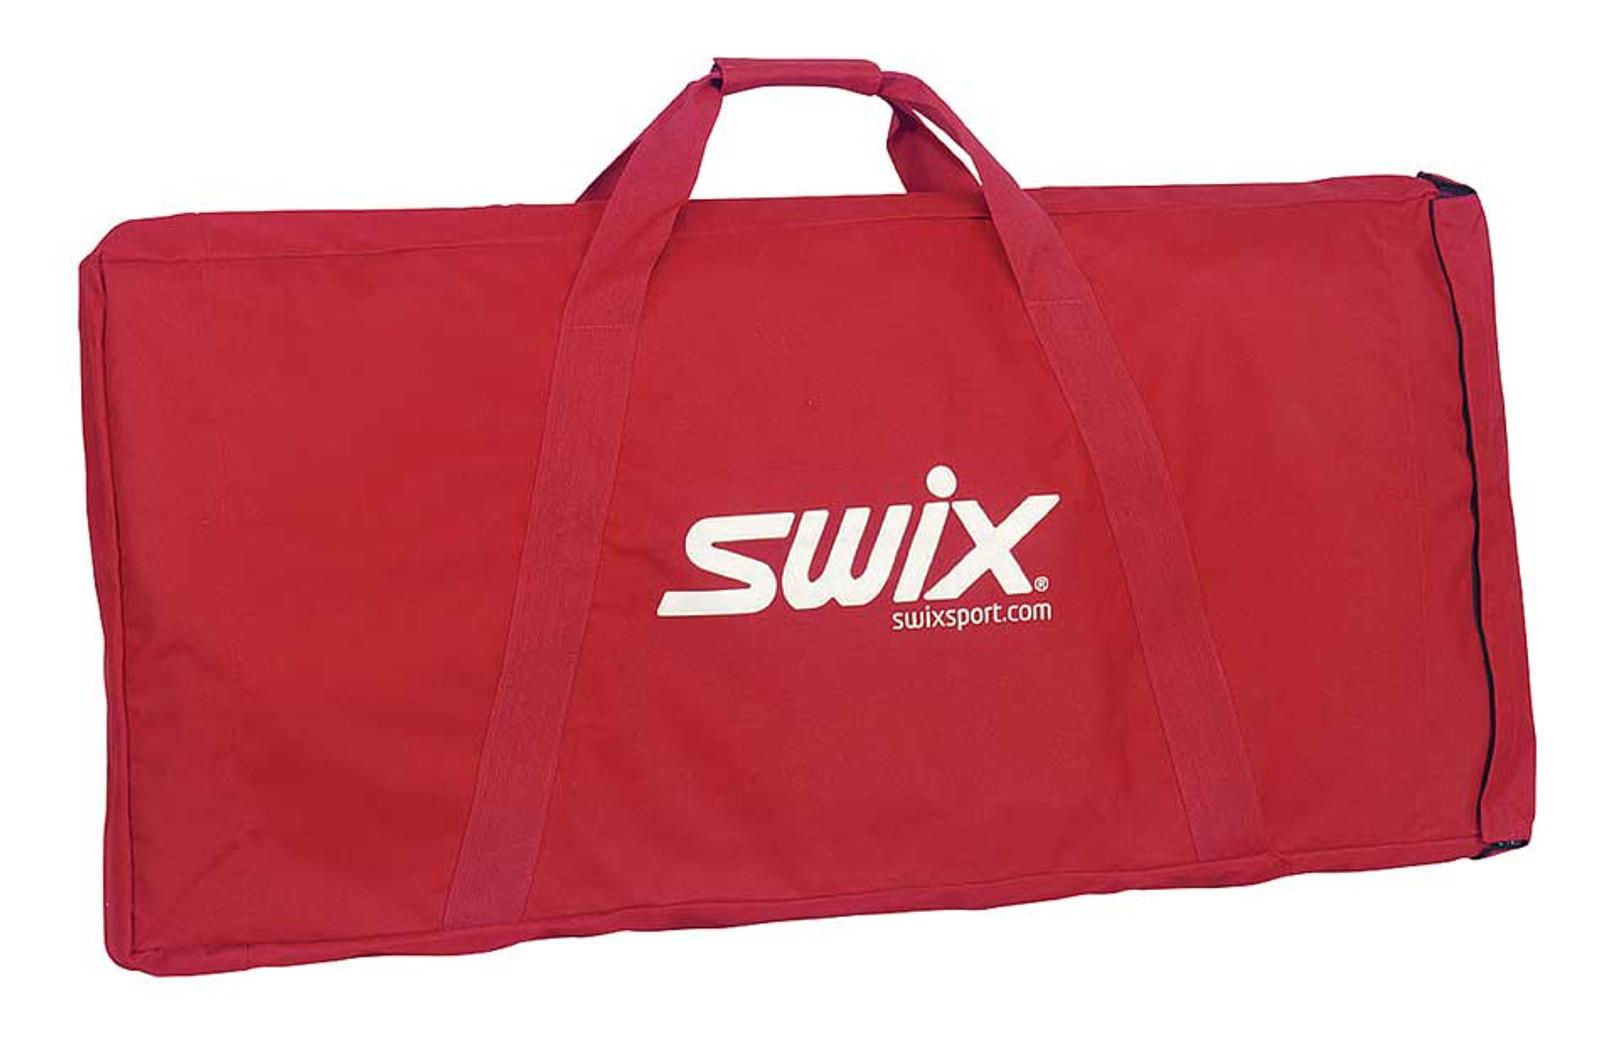 Swix T754 Tuning Table Bag